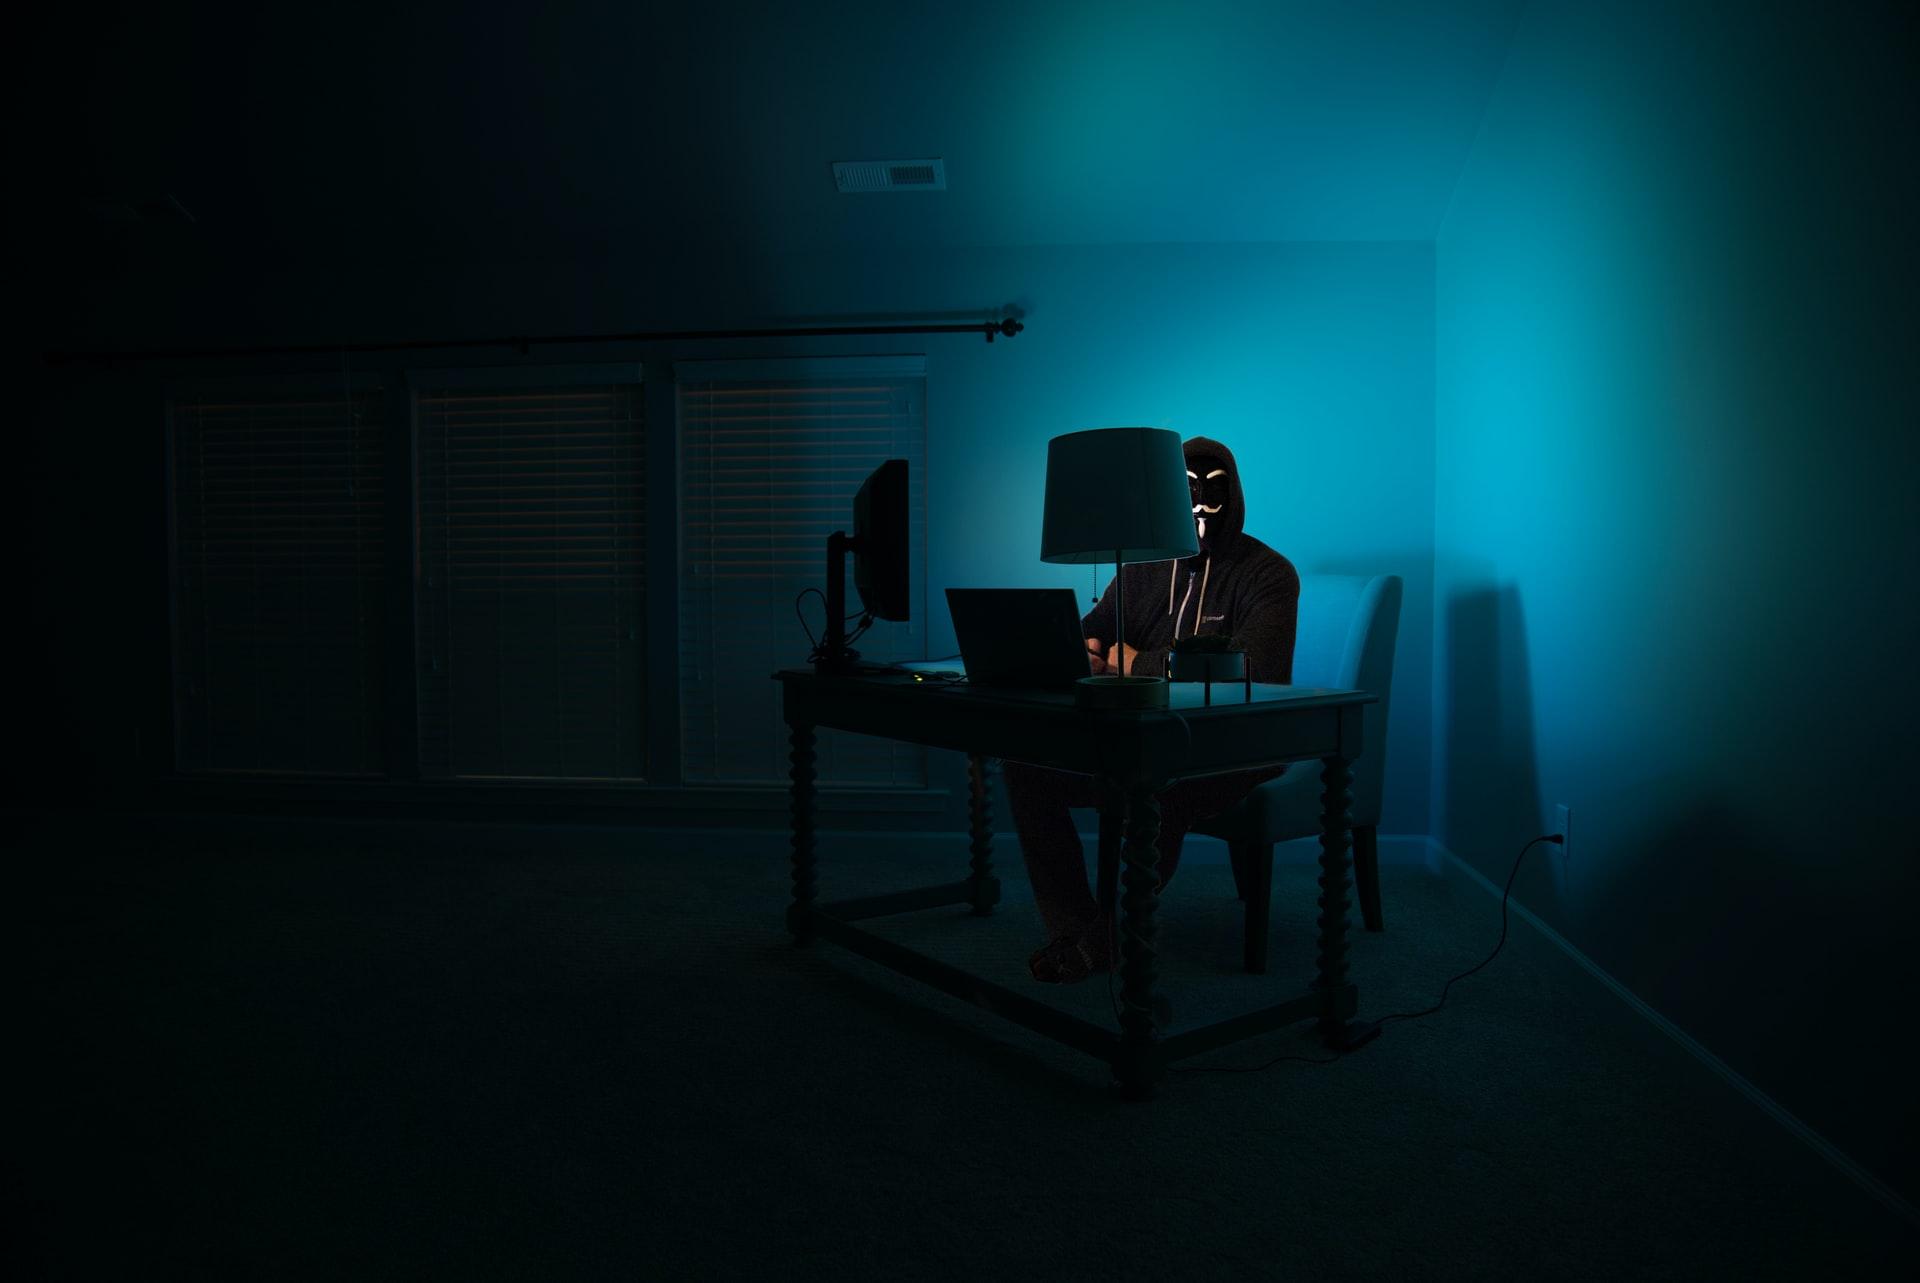 hooded hacker computers